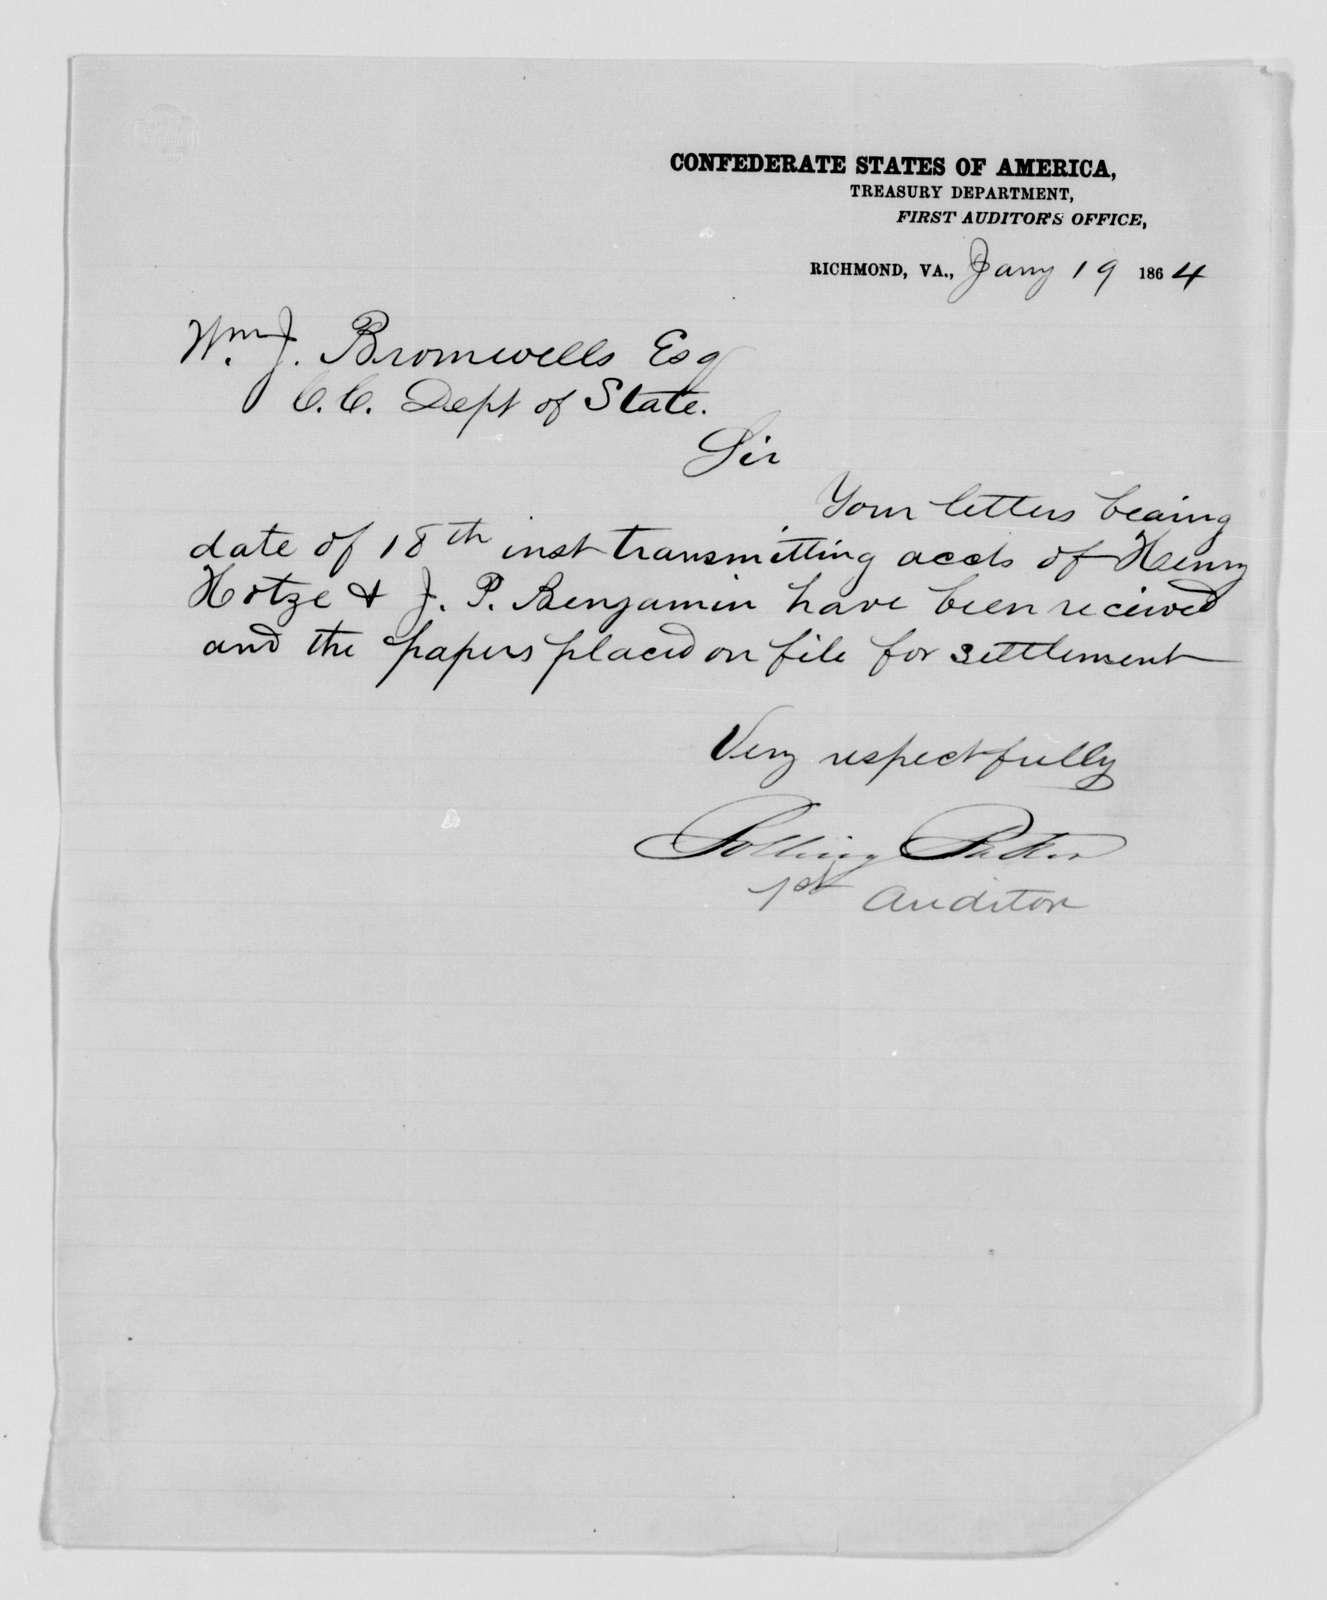 Confederate States of America records: Microfilm Reel 17